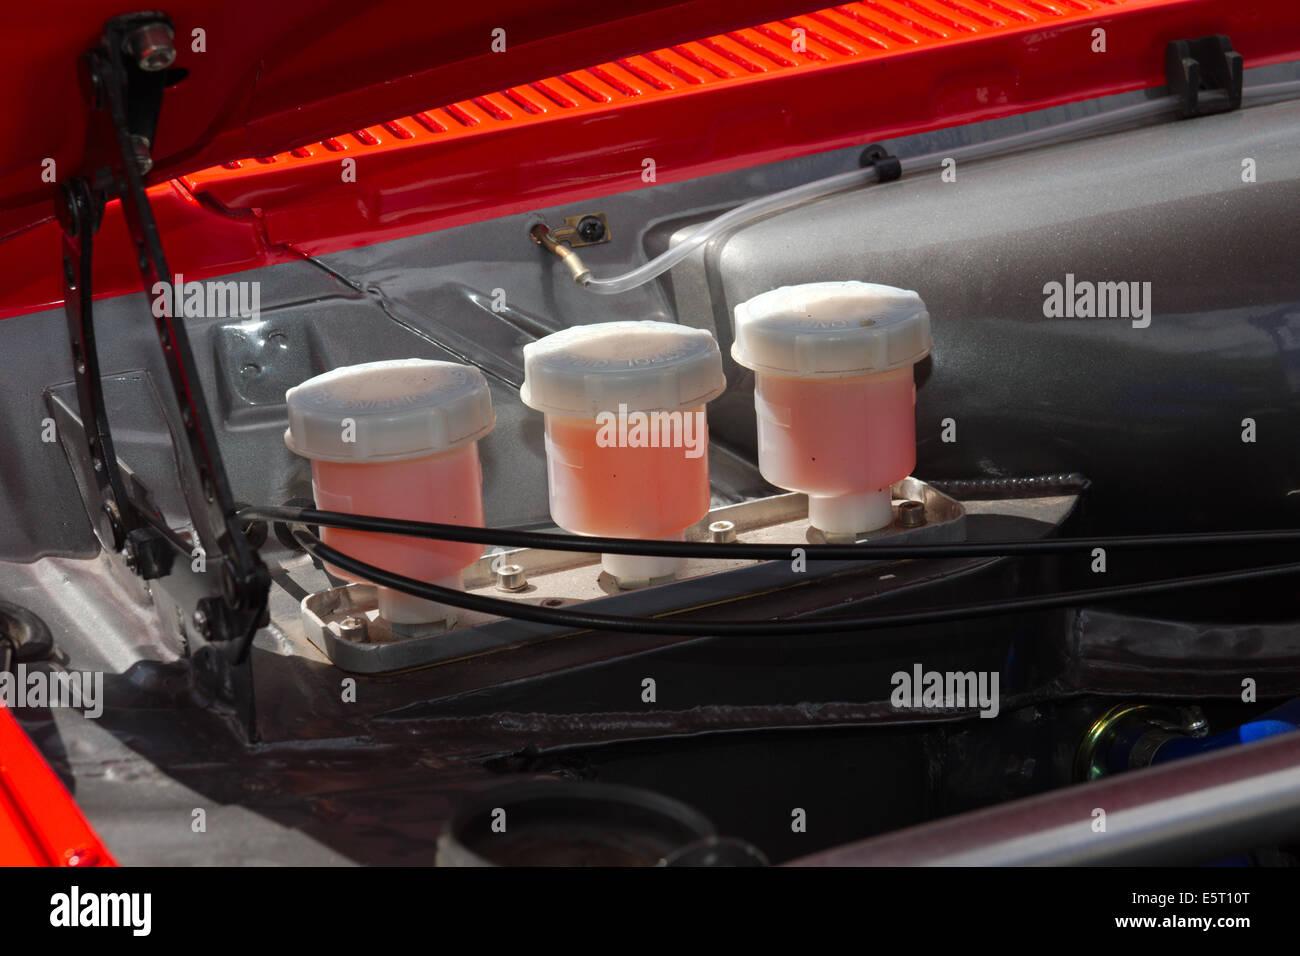 Nett Automotor Bild Fotos - Elektrische Schaltplan-Ideen ...